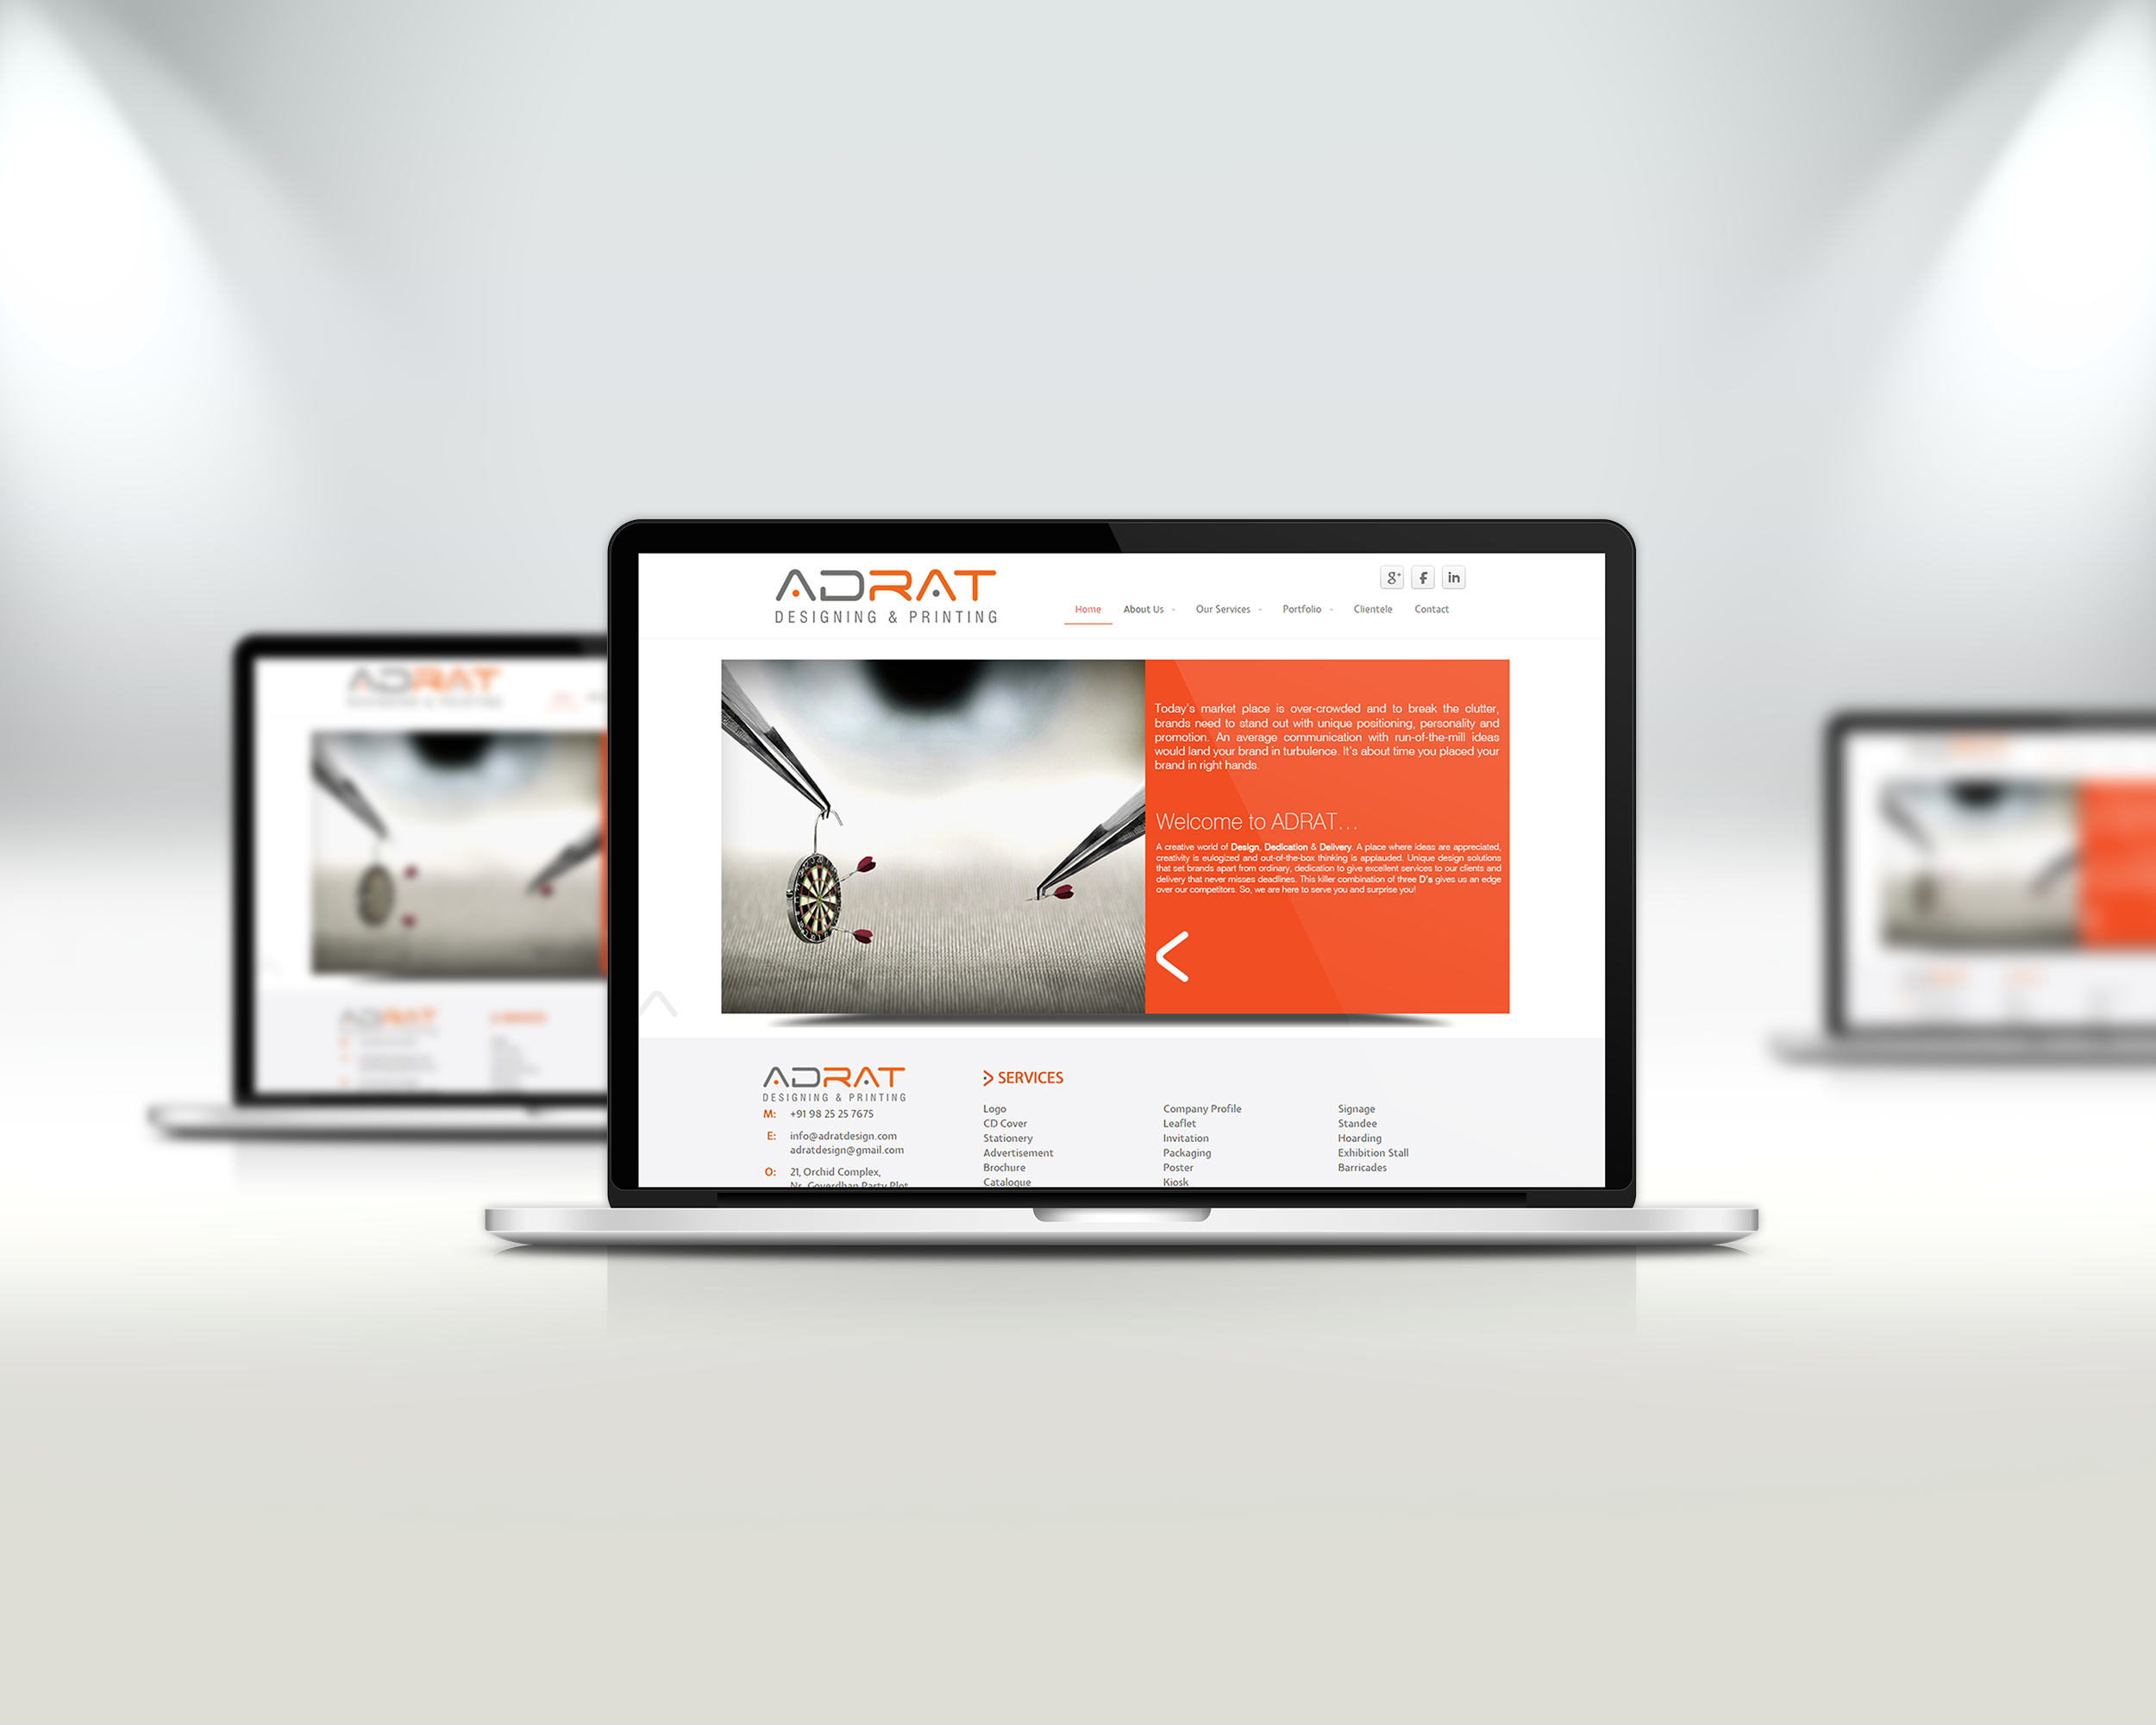 Adrat Design - Shaddock Solutions Ahmedabad, India